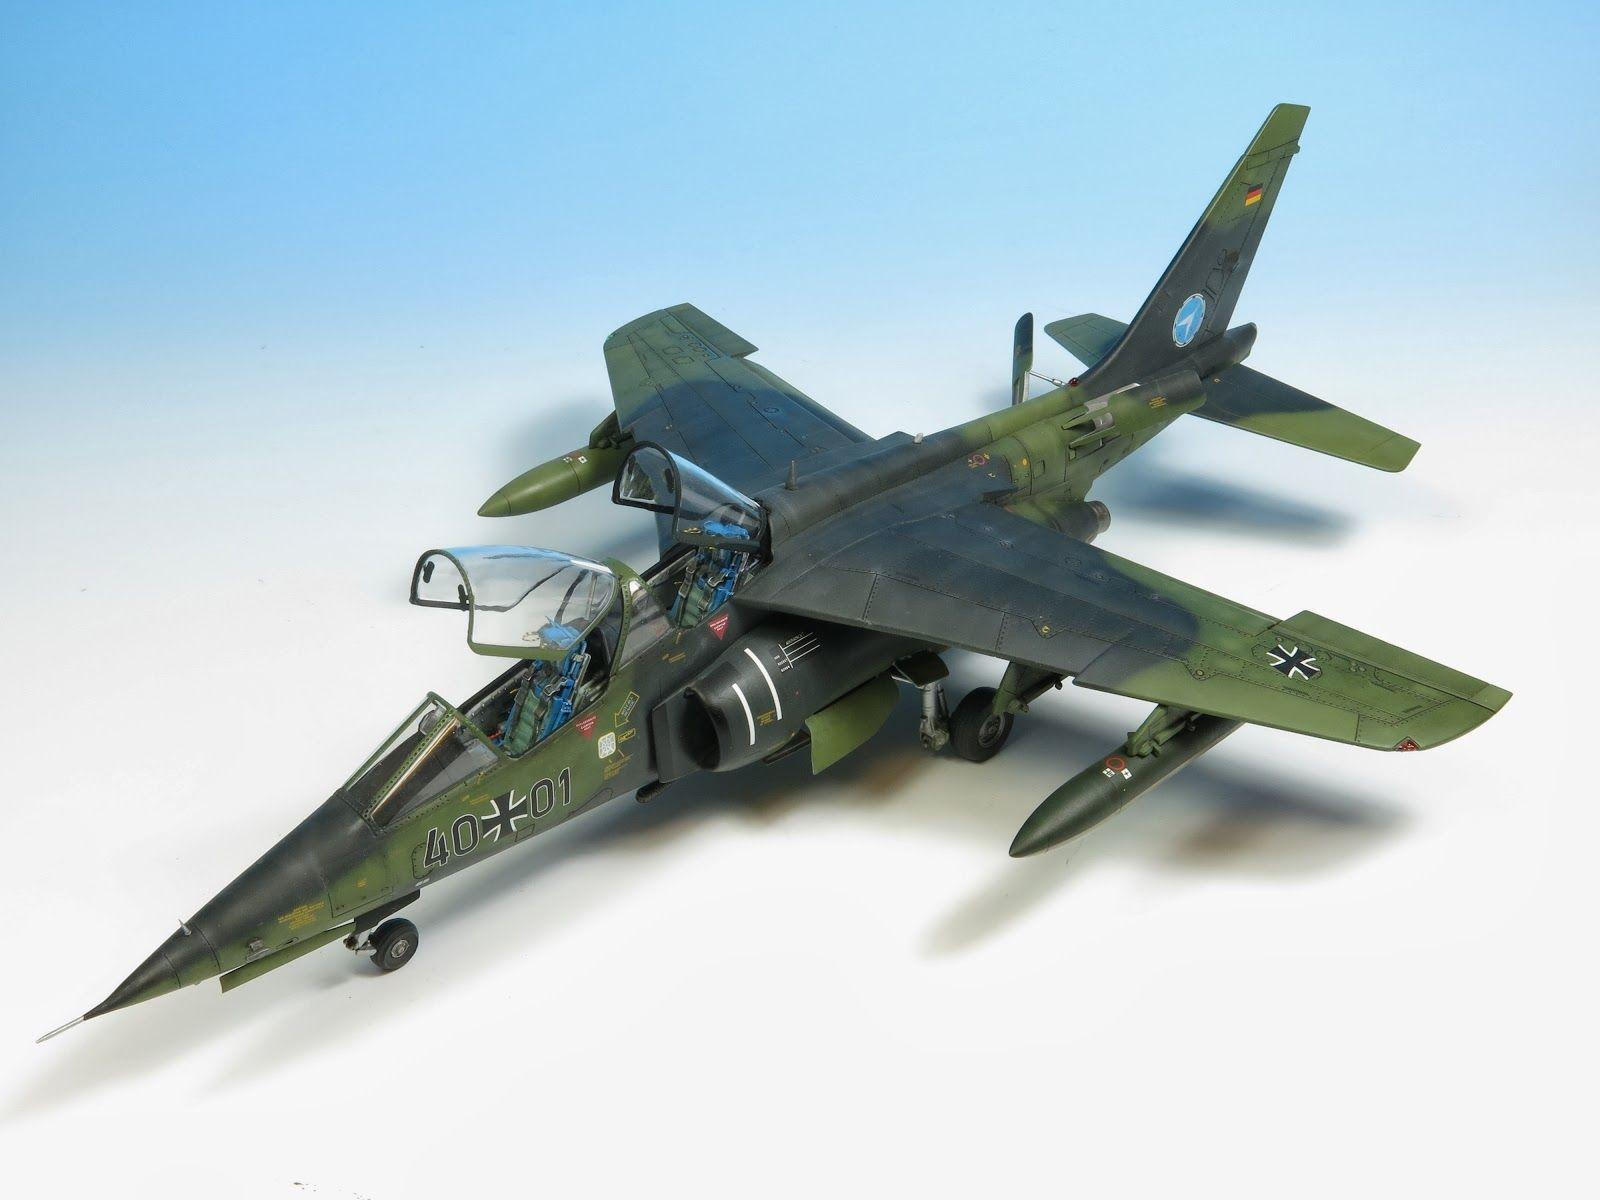 Papercraft Jet Dassault Dornier Alpha Jet 1 48 Scale Model